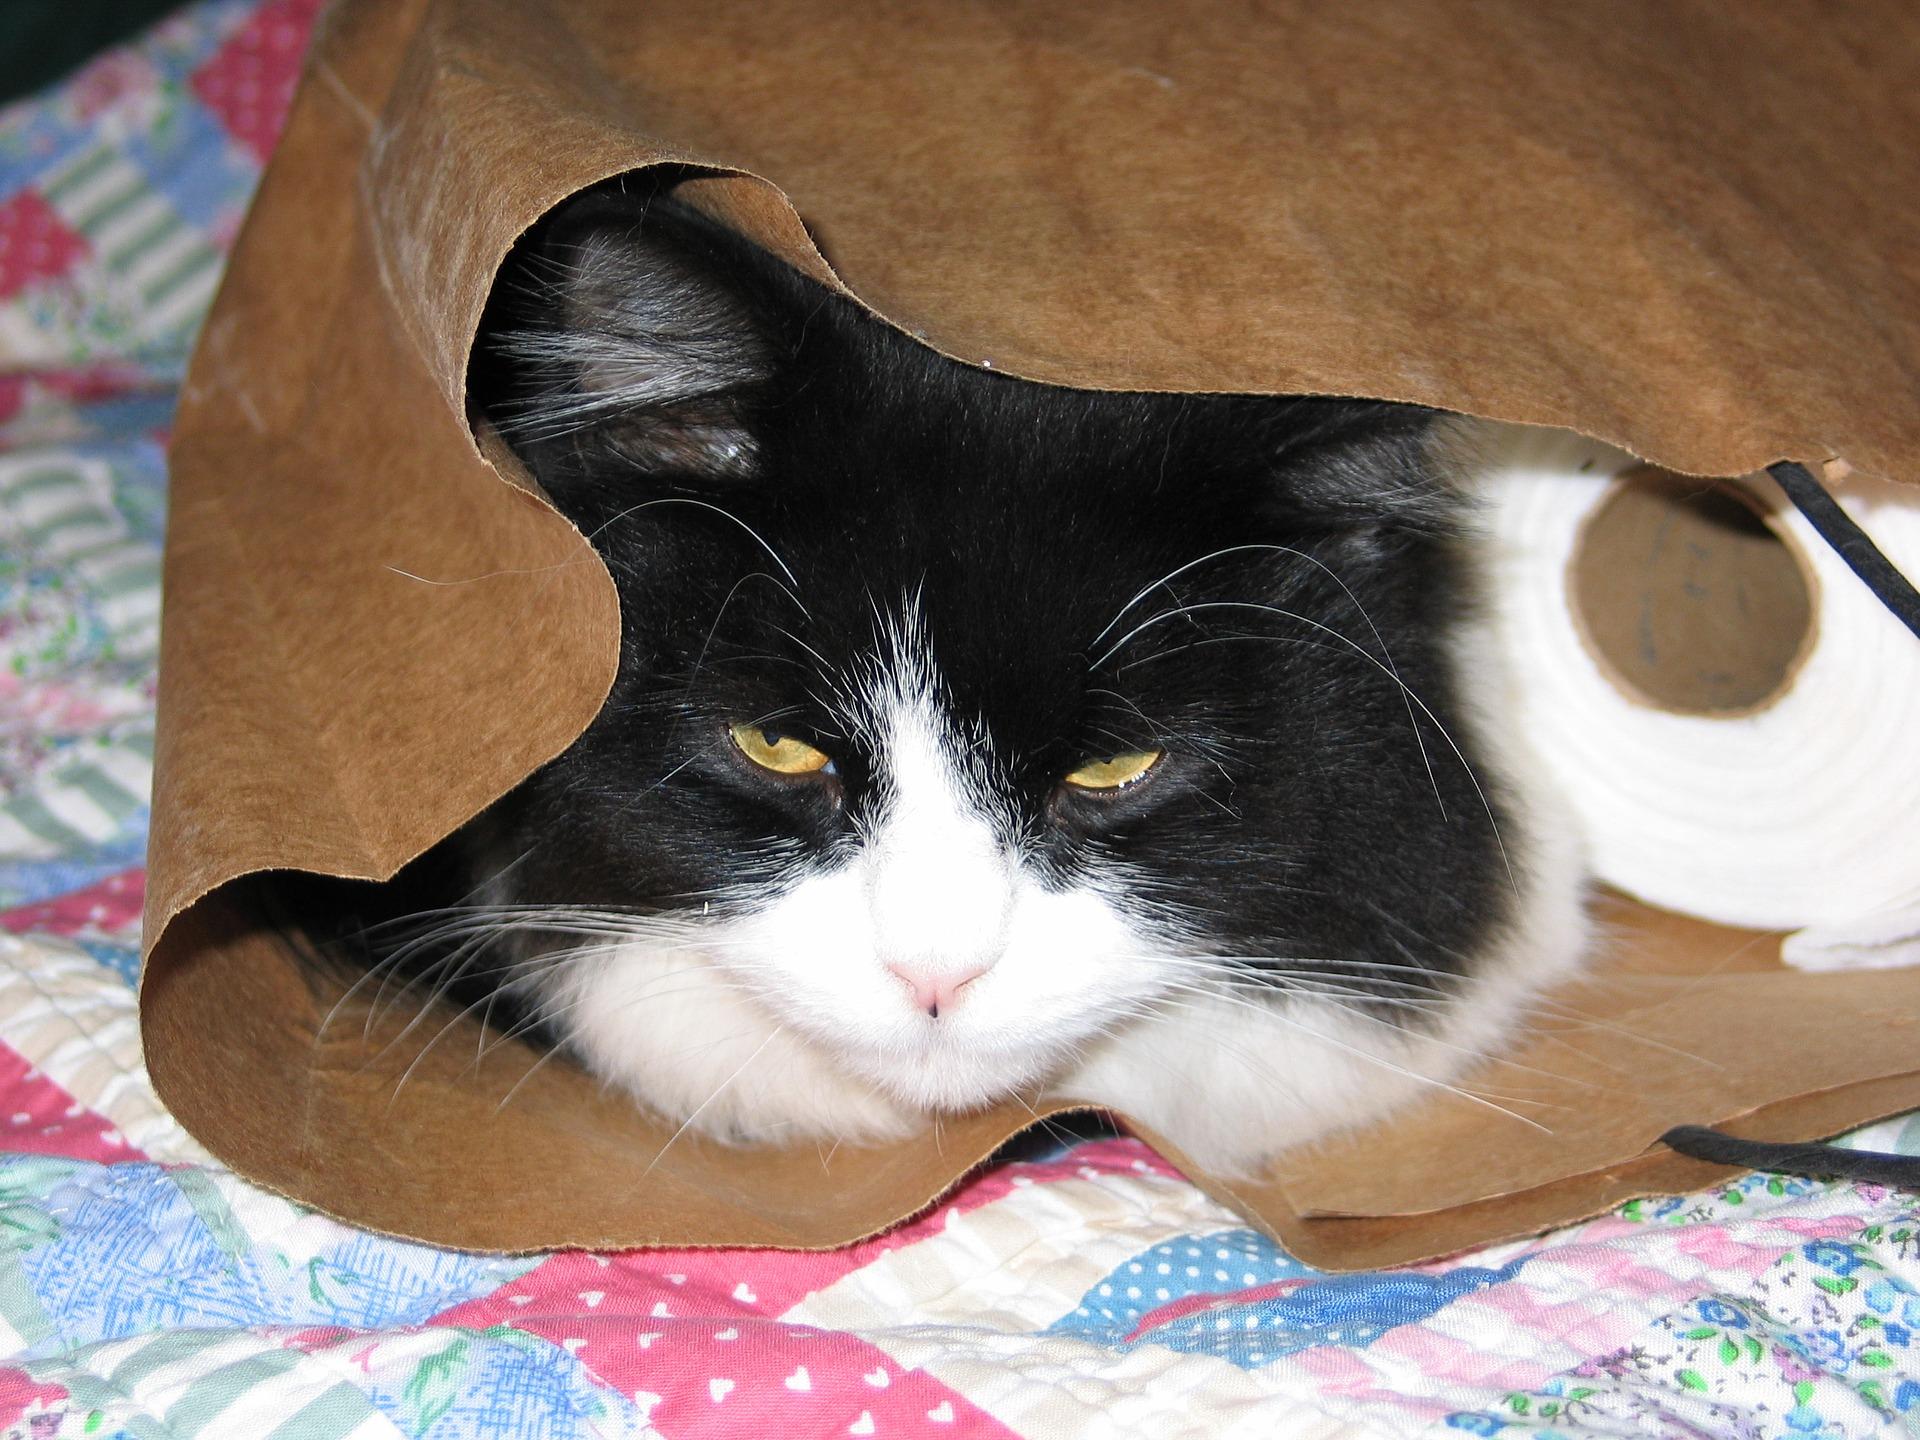 cat-1816646_1920.jpg